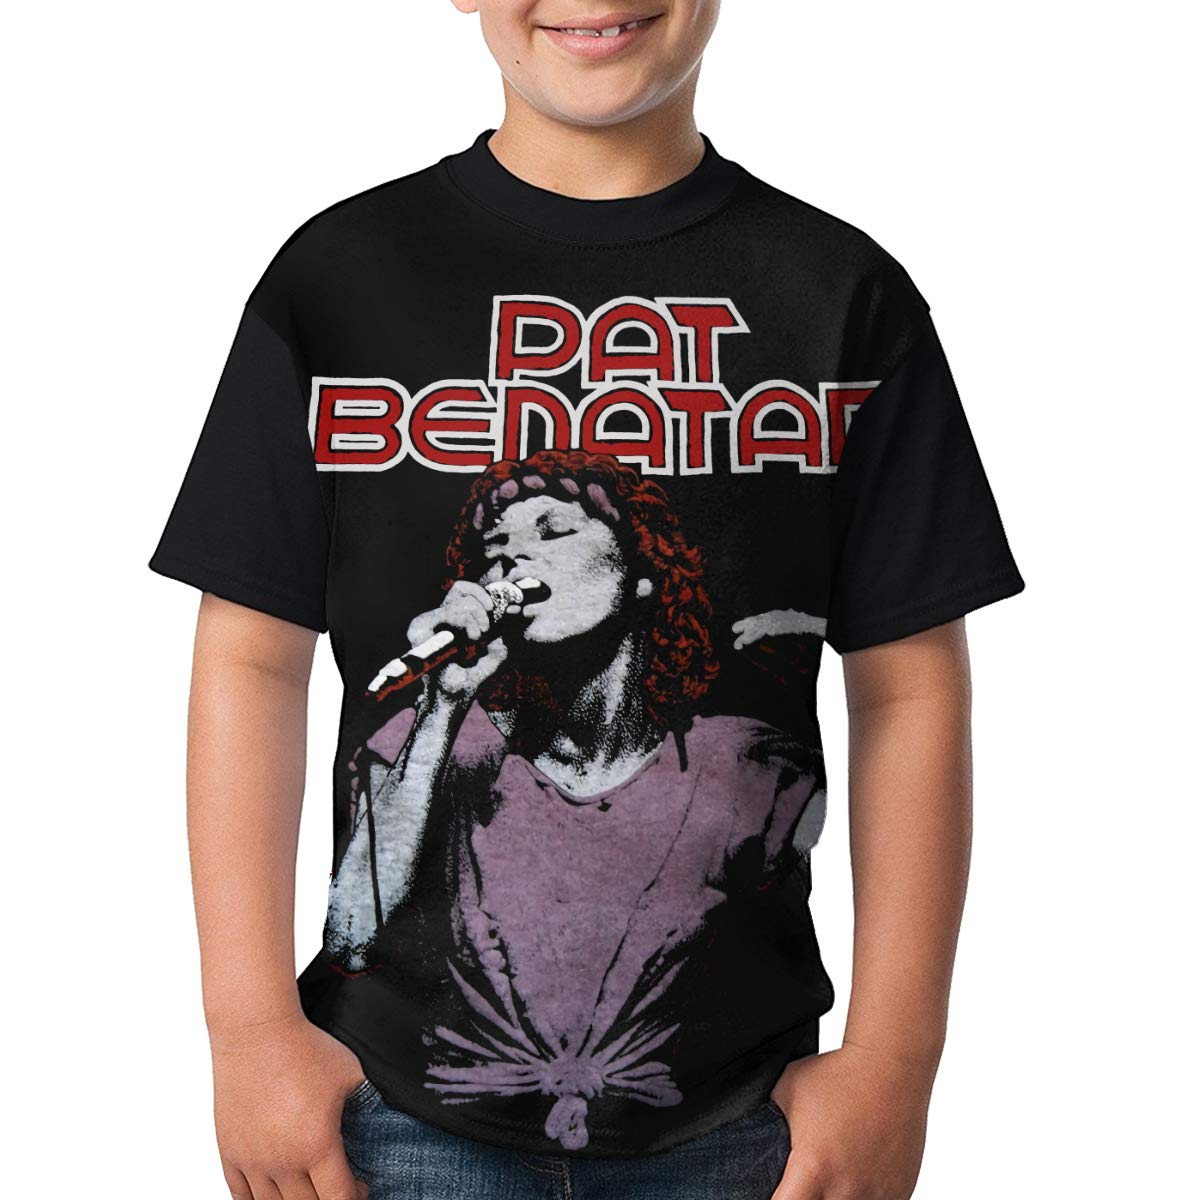 JustinLSullivan Pat Benatar T Shirt Youth Shirt Boys Teenager Round Neck Short Sleeve Tee